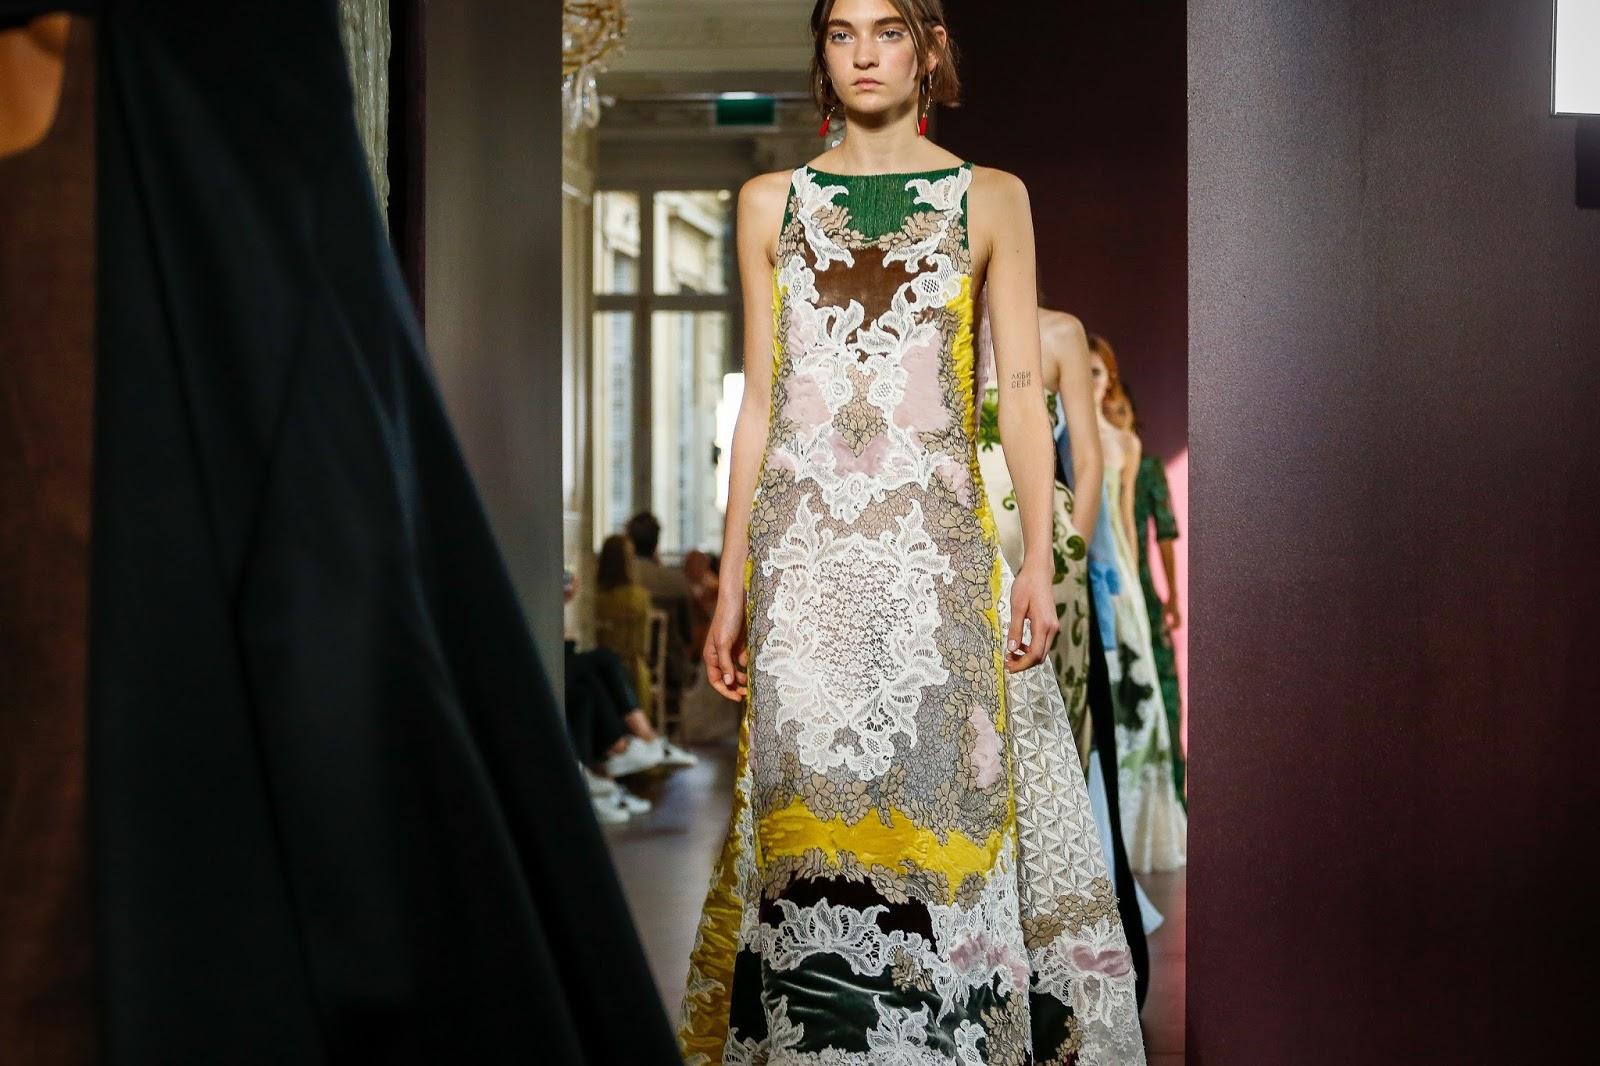 Valentino 39 s haute couture autumn winter 17 show bts for Haute couture today